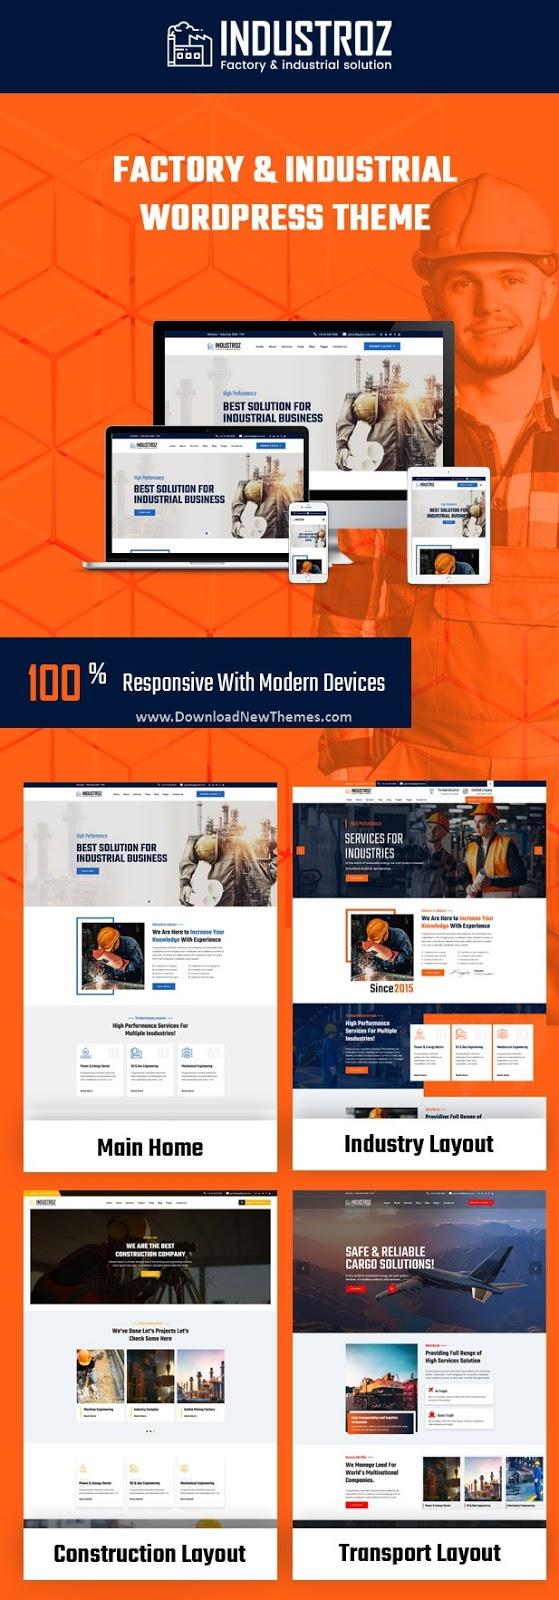 Best Factory & Industrial Premium WordPress Theme